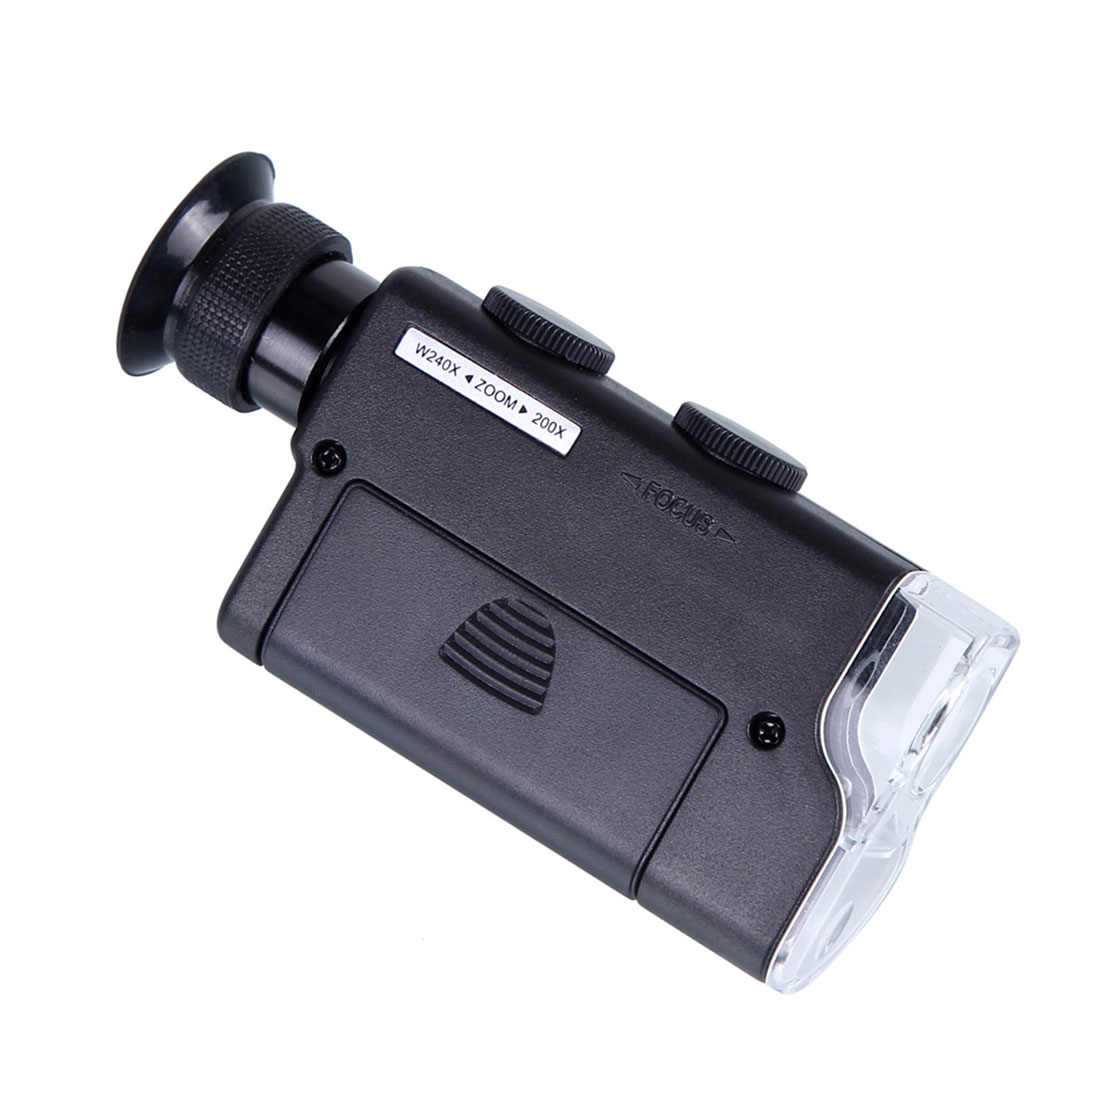 Hot!Mini Portable Microscope Pocket 200X~240X Handheld LED Lamp Light Loupe Zoom Magnifier Magnifying Glass Pocket Lens new pocket magnifier 50x blue coated large lens handheld microscope for jewelry identification